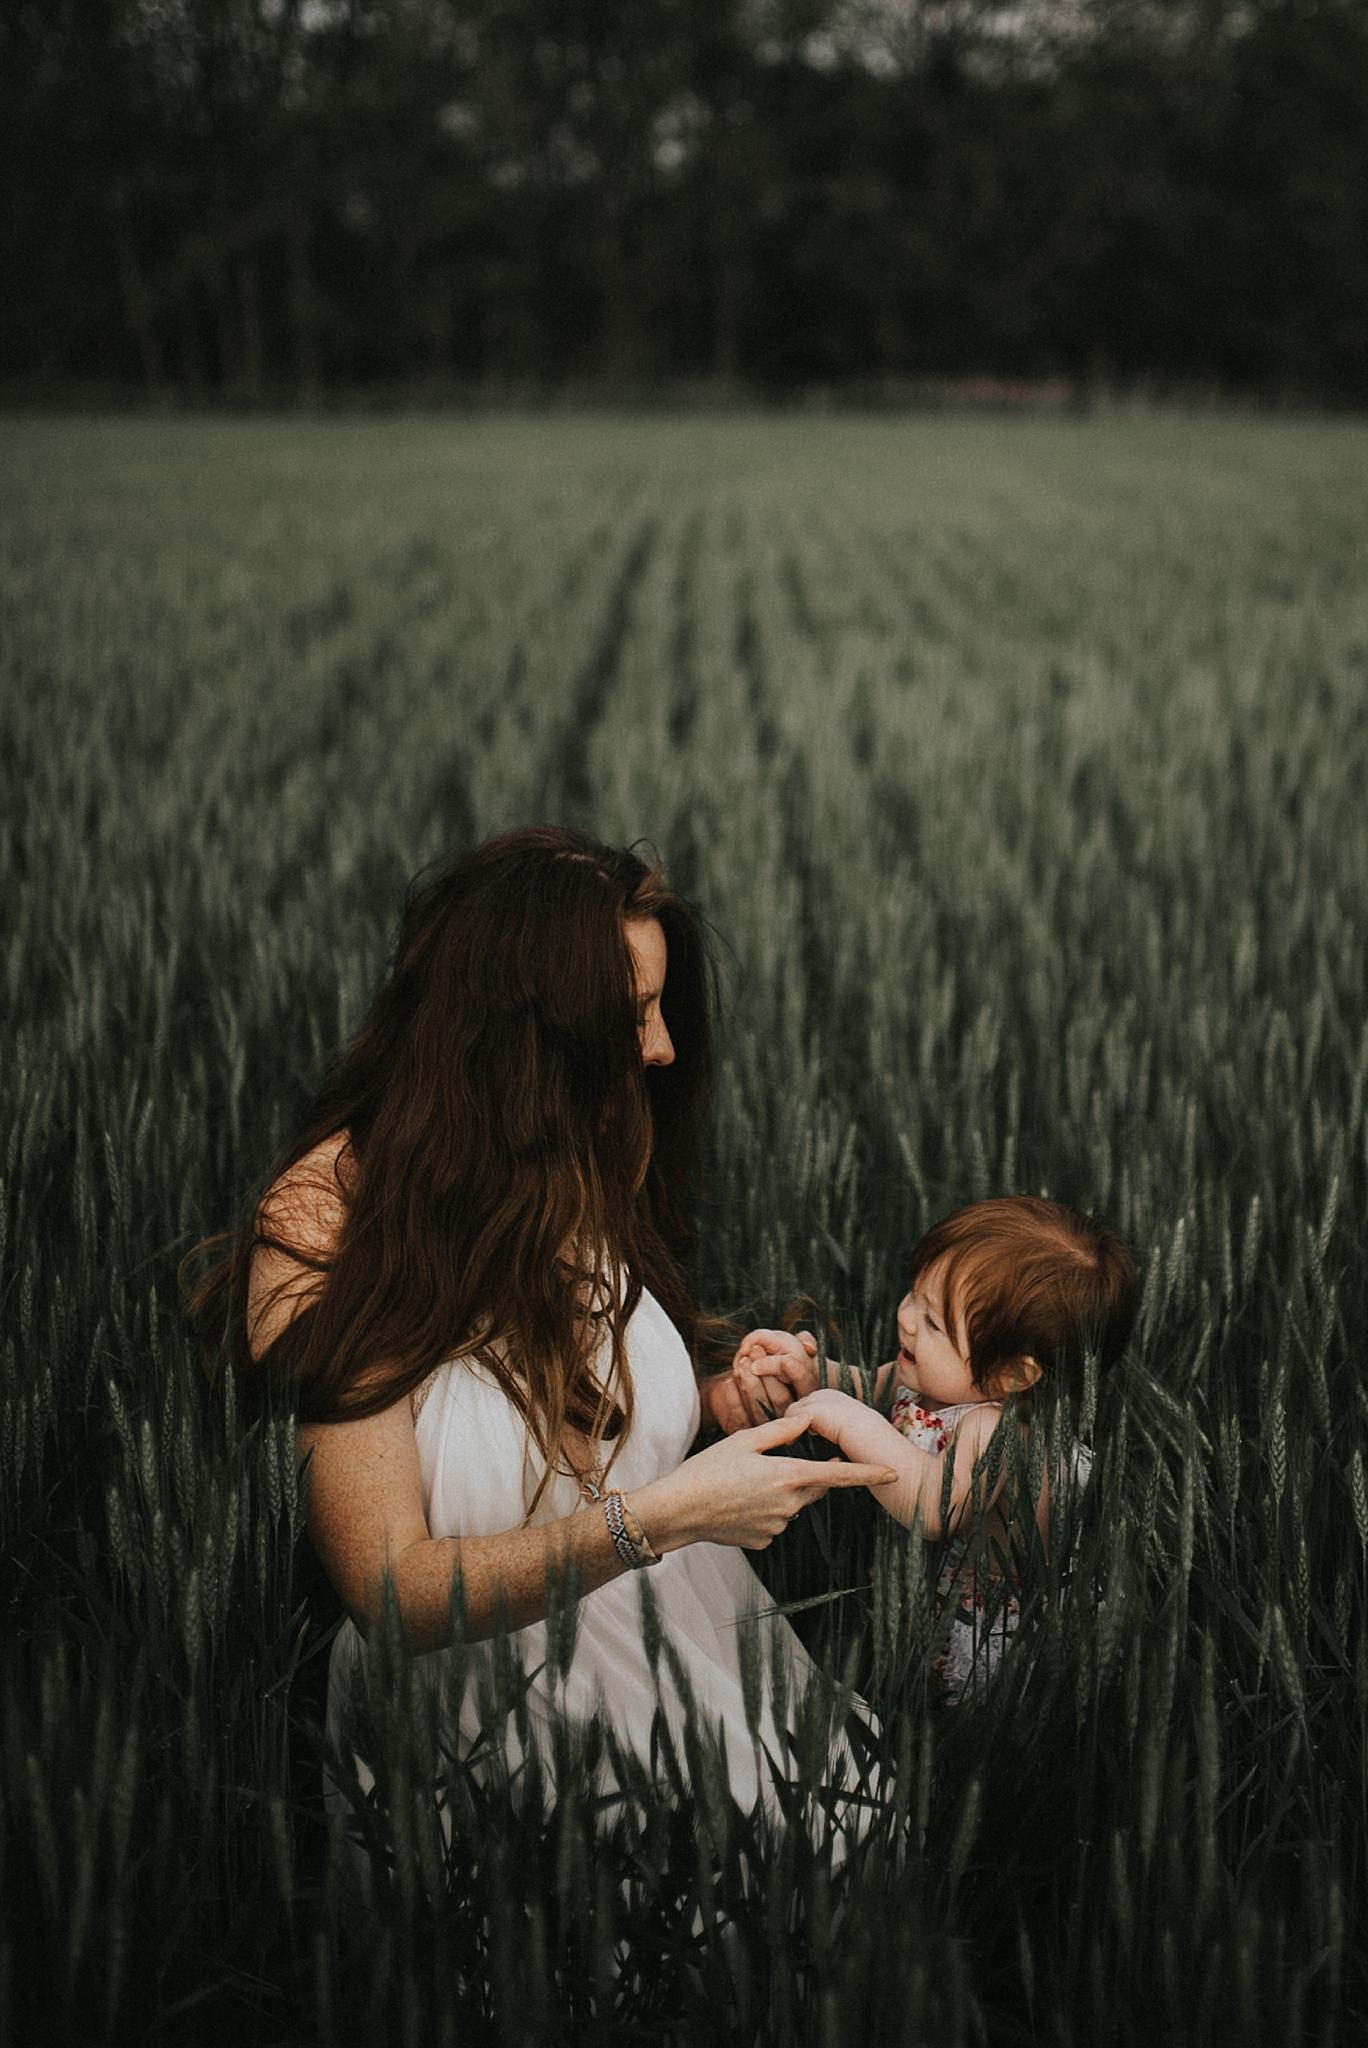 twyla jones photography - mother daughter - field and forest-4443_treasure coast florida.jpg